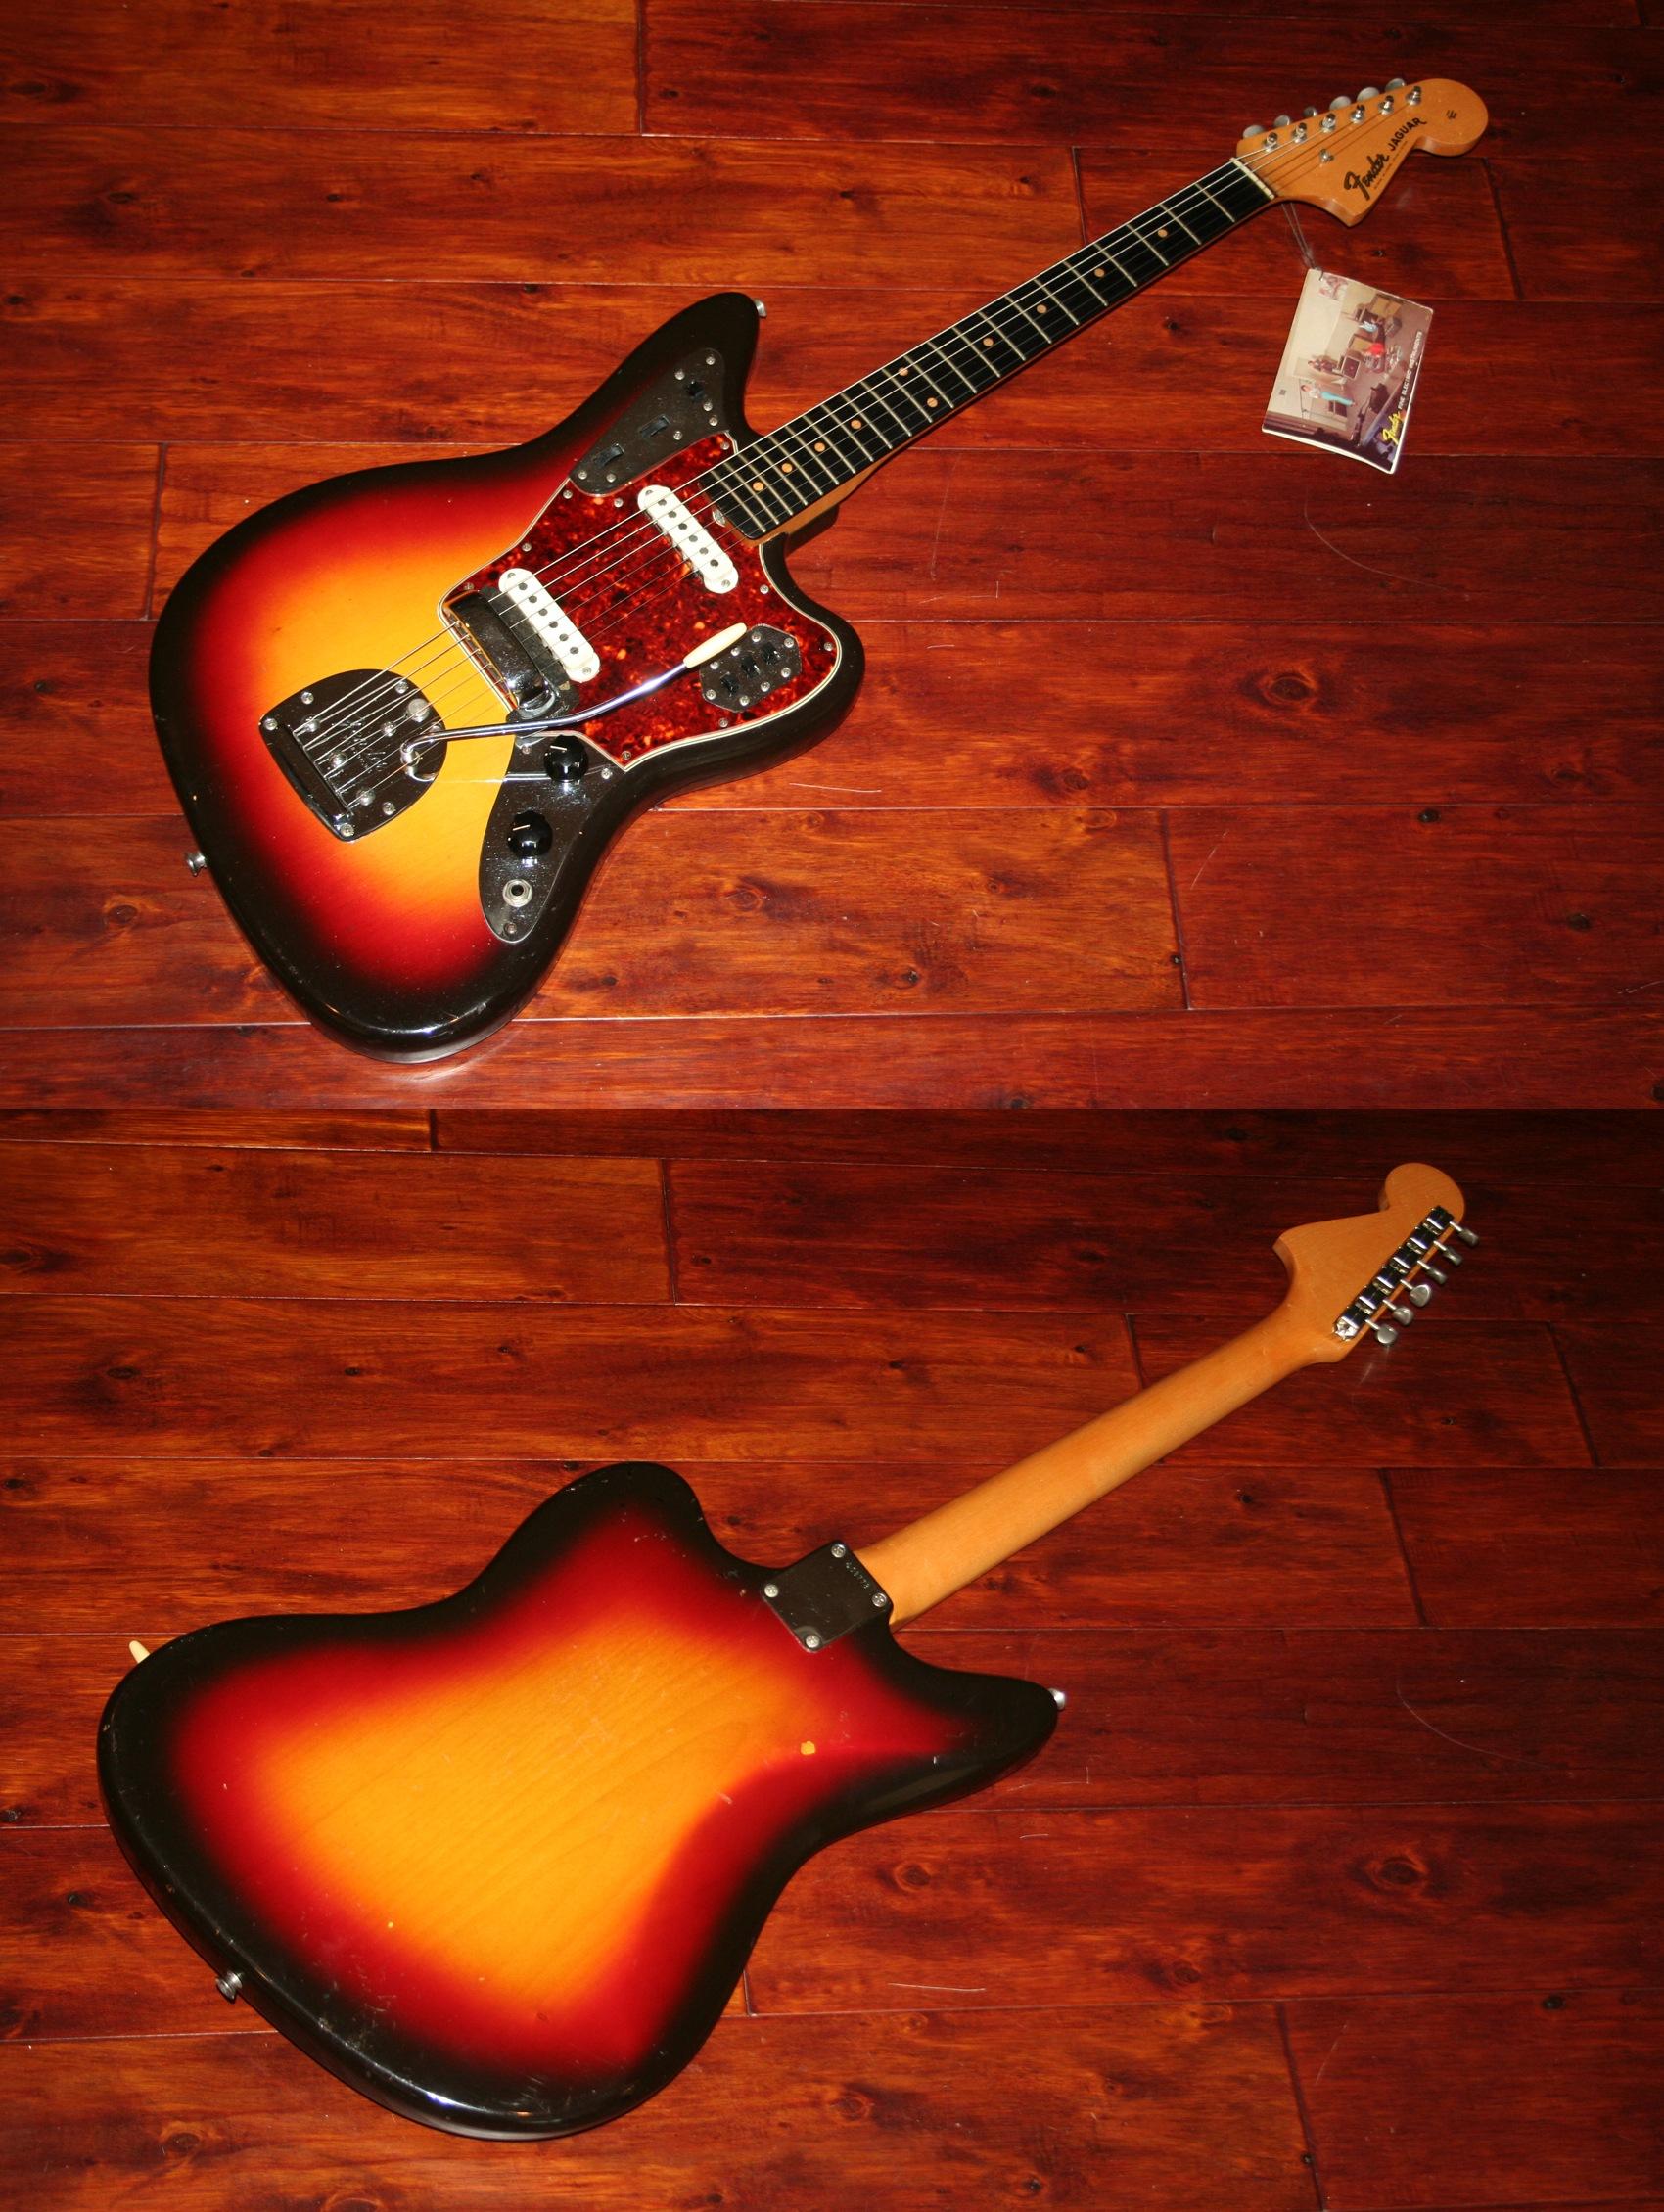 professional sonic jaguar imperial vintage american guitar electric guitars fender wohsc grey product